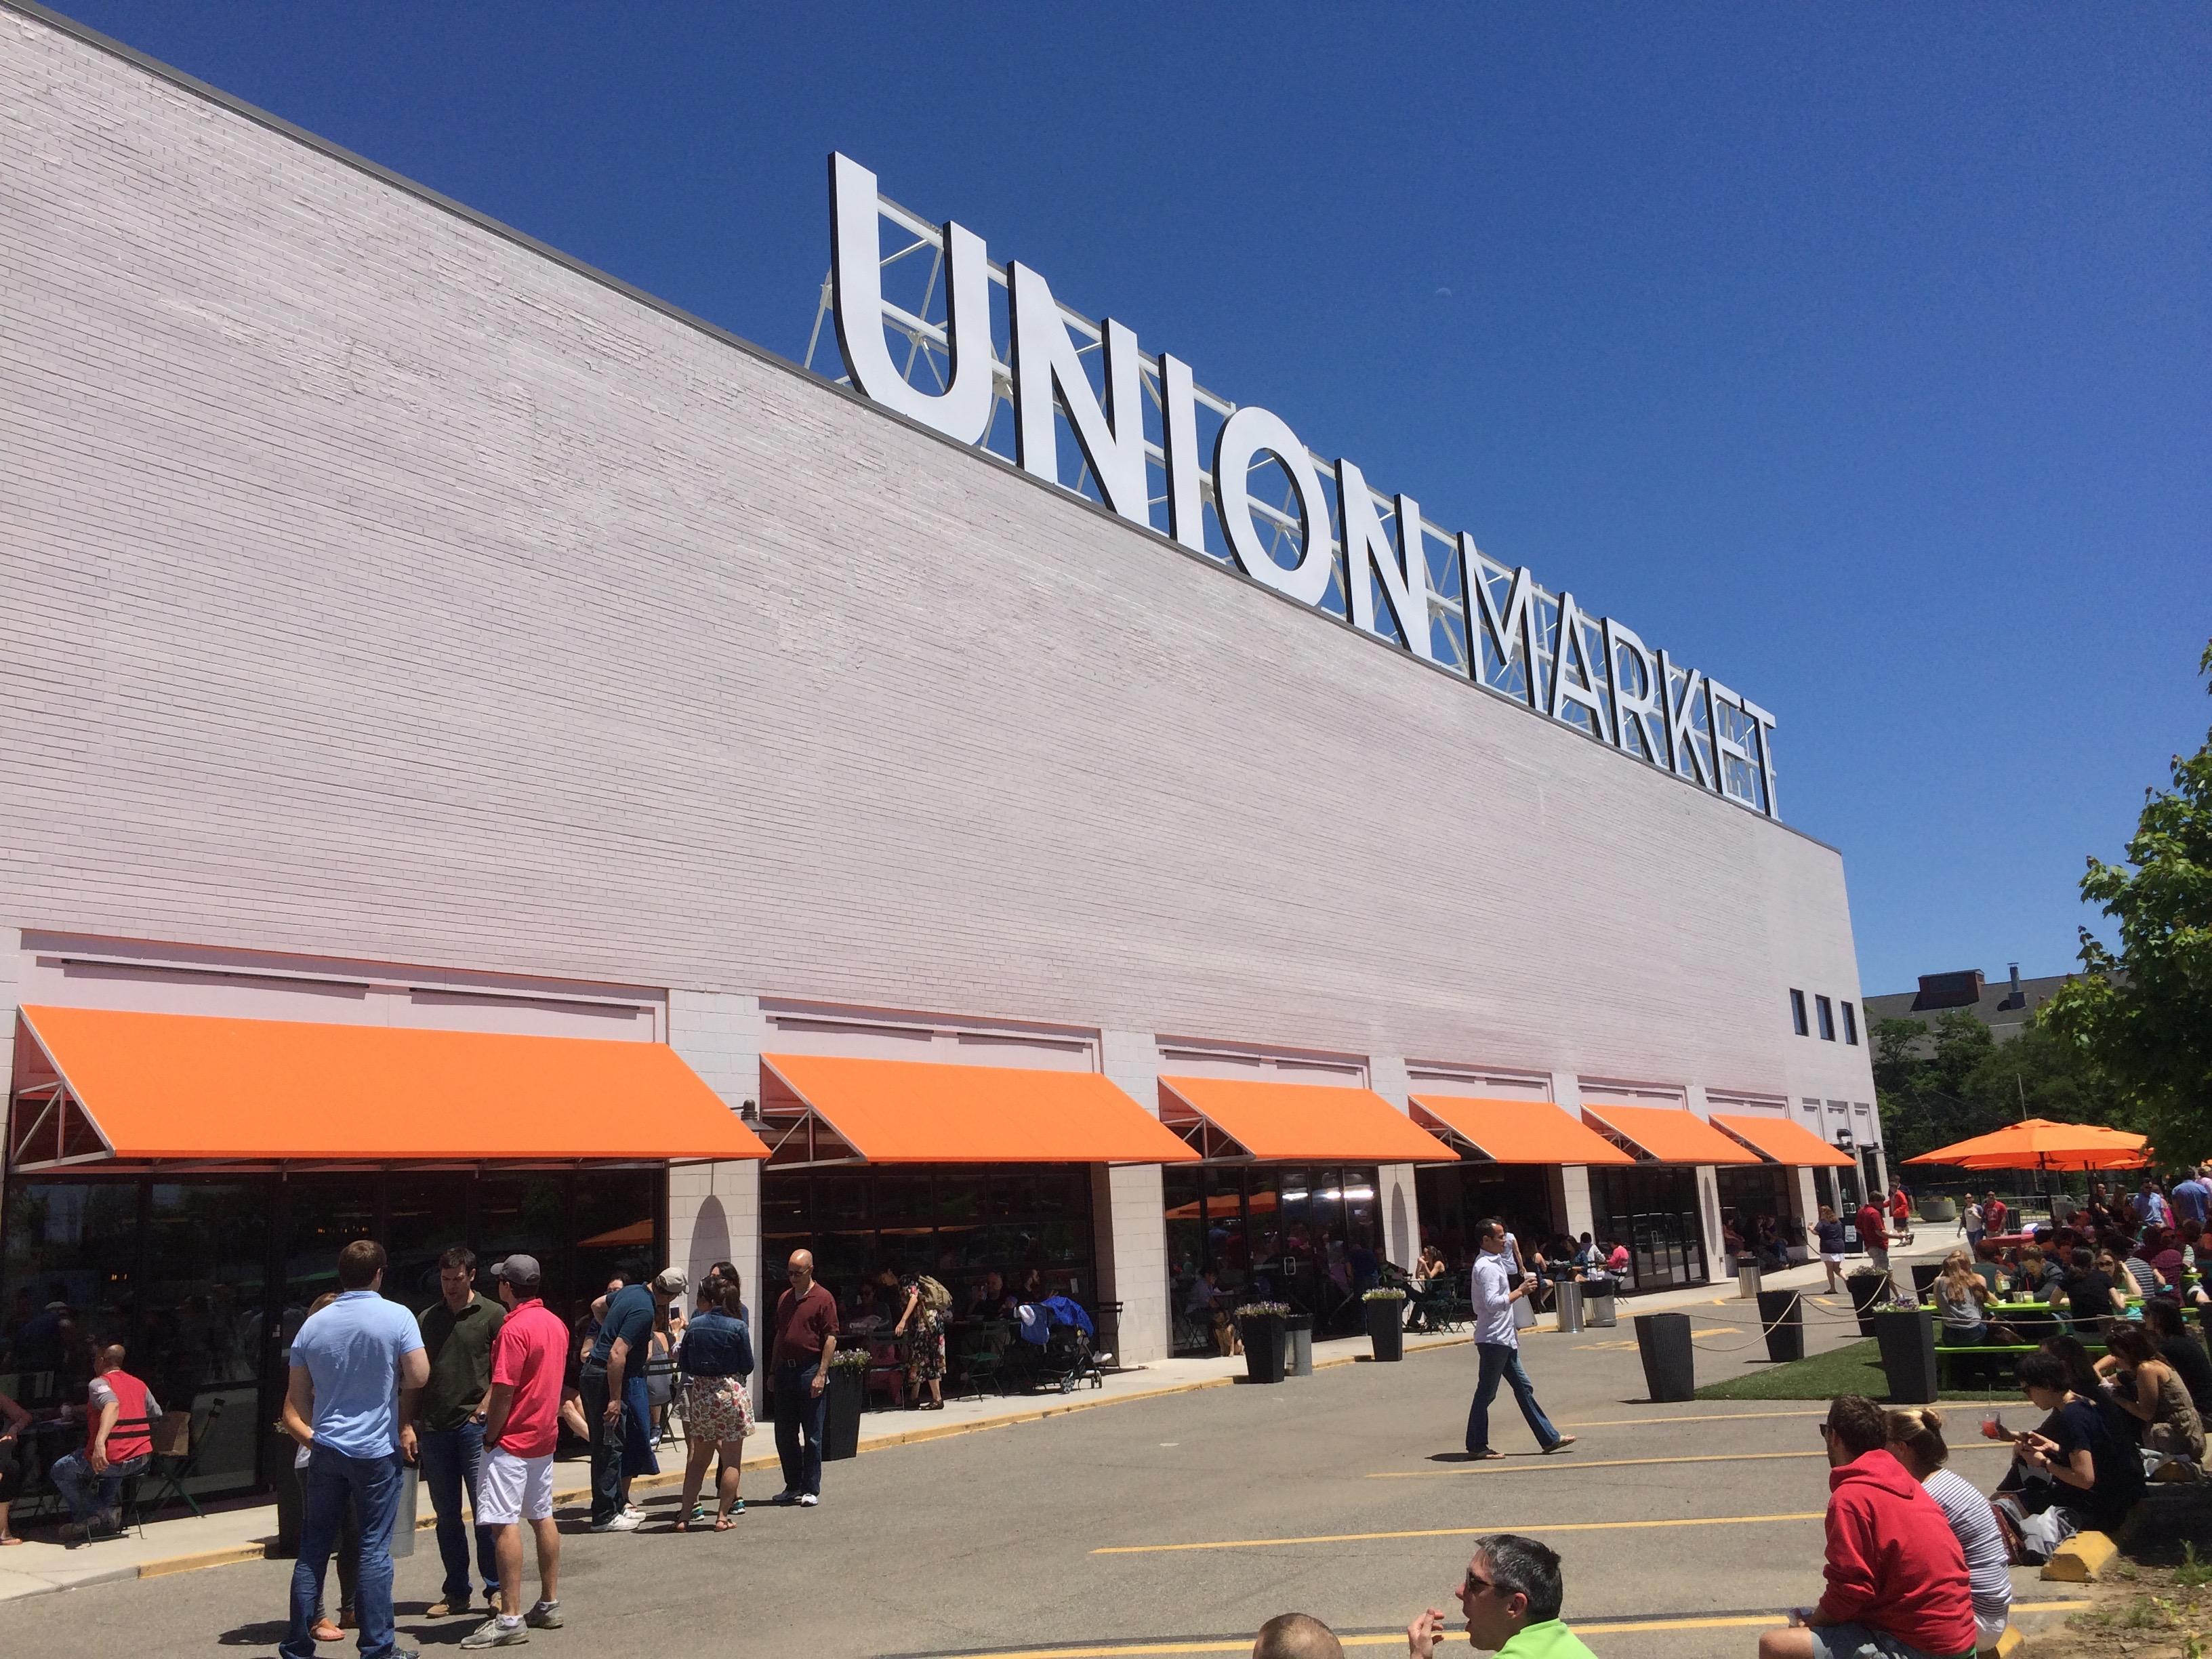 Staycation A Trip To Union Market Washington Dc The